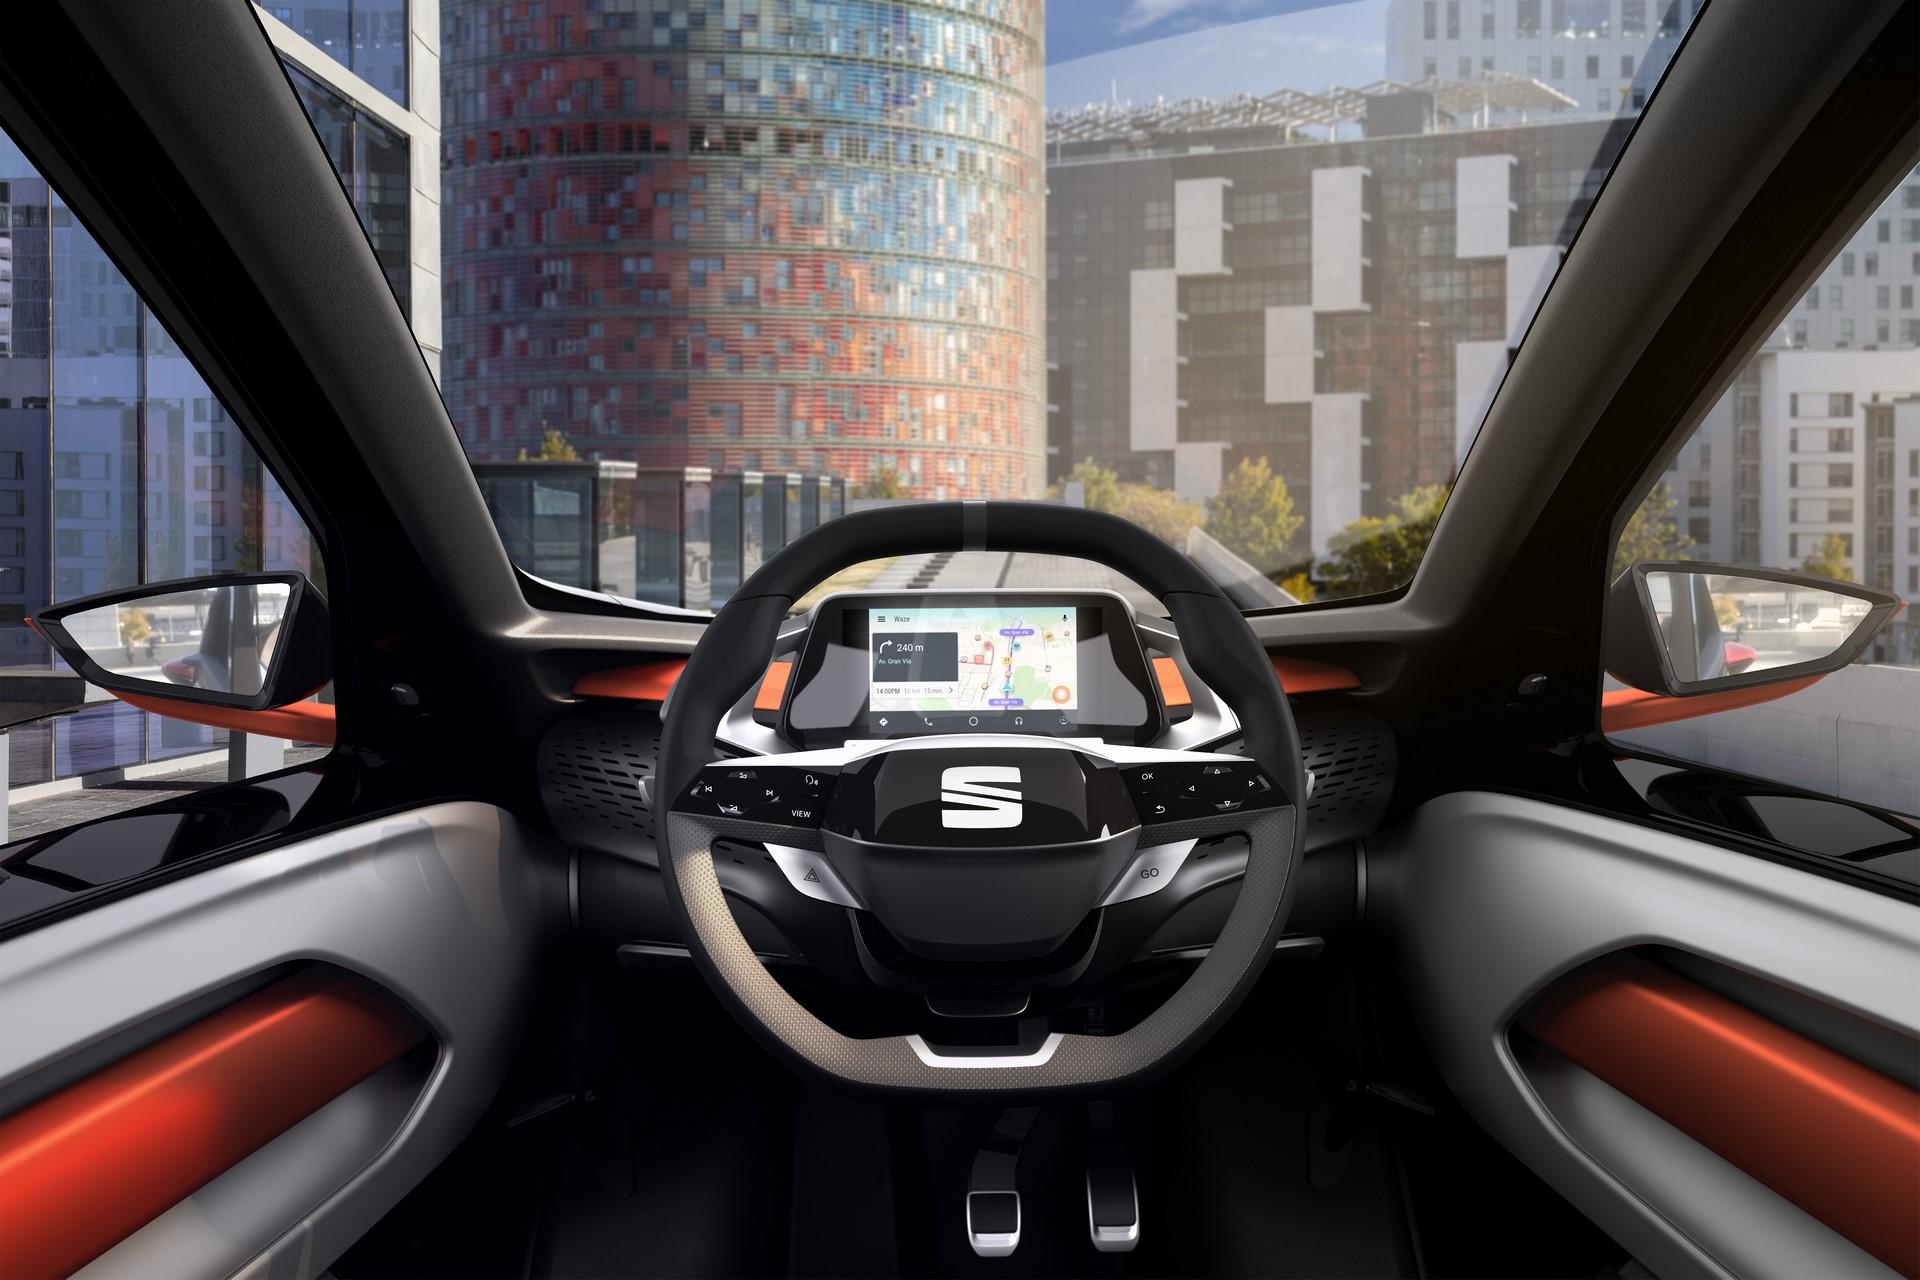 Seat Minimo concept (8)